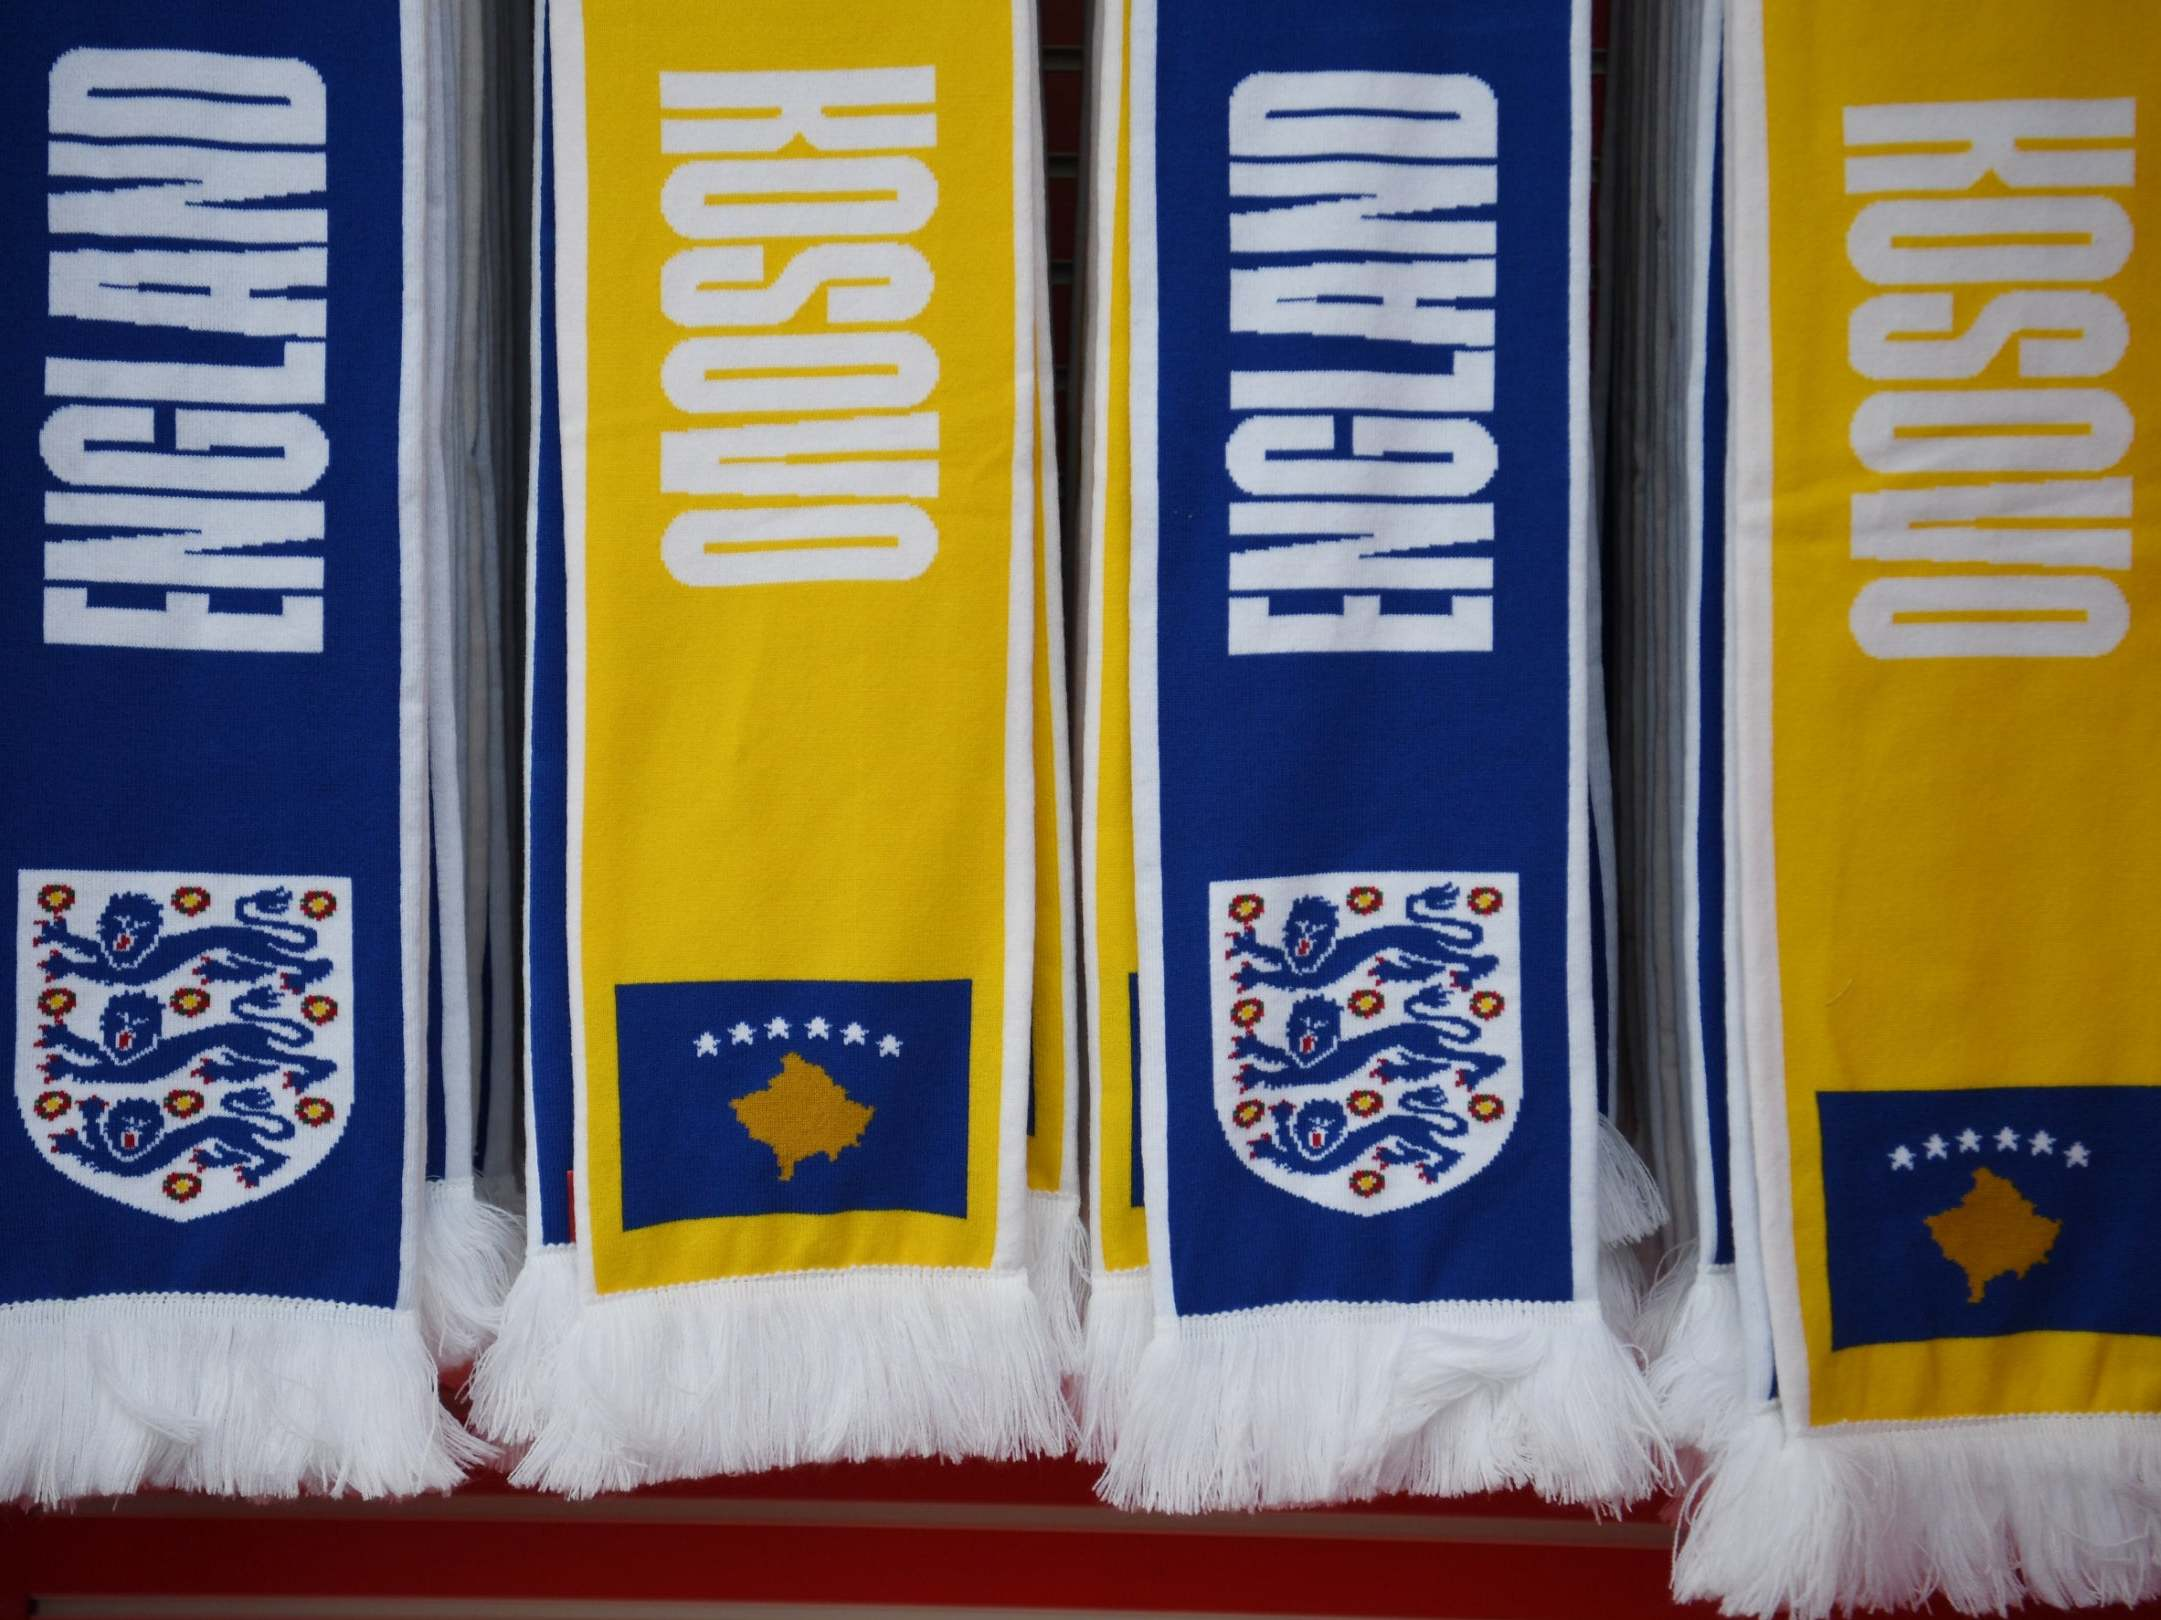 England Vs Kosovo images